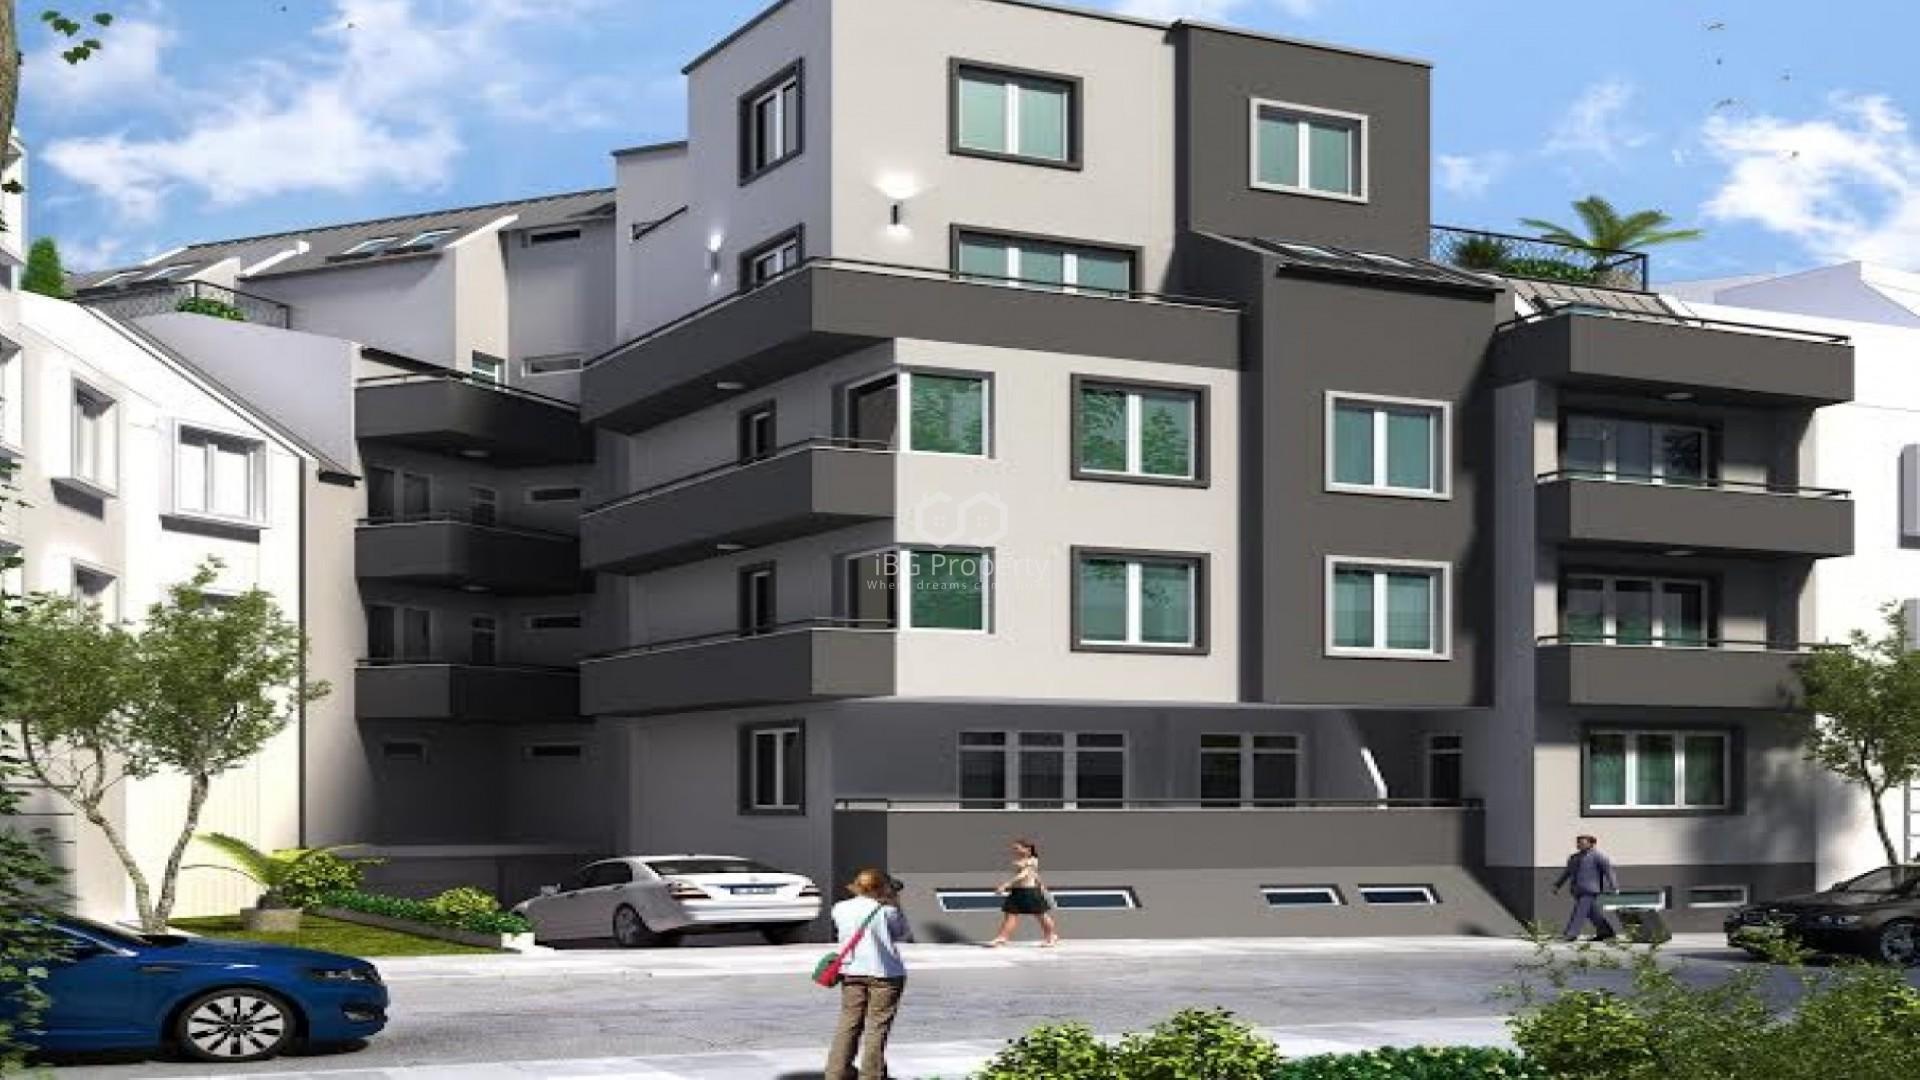 Двустаен апартамент Погреби Варна 62 m2